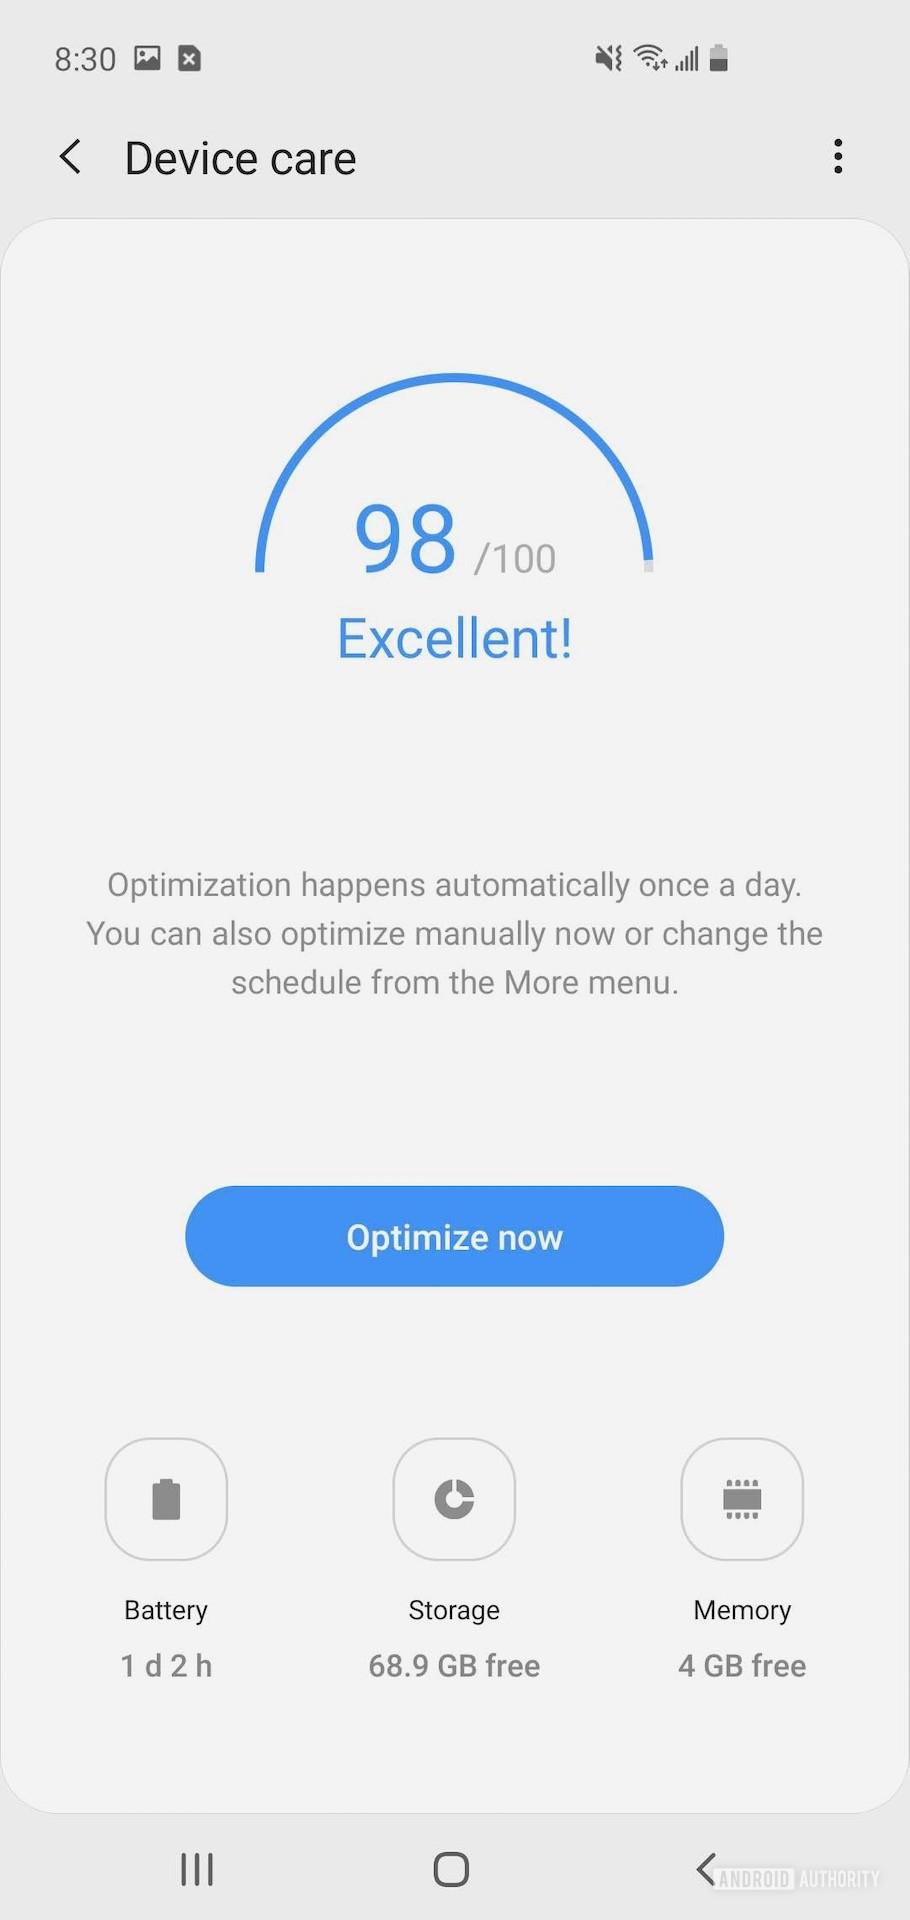 Samsung One UI 1 device care